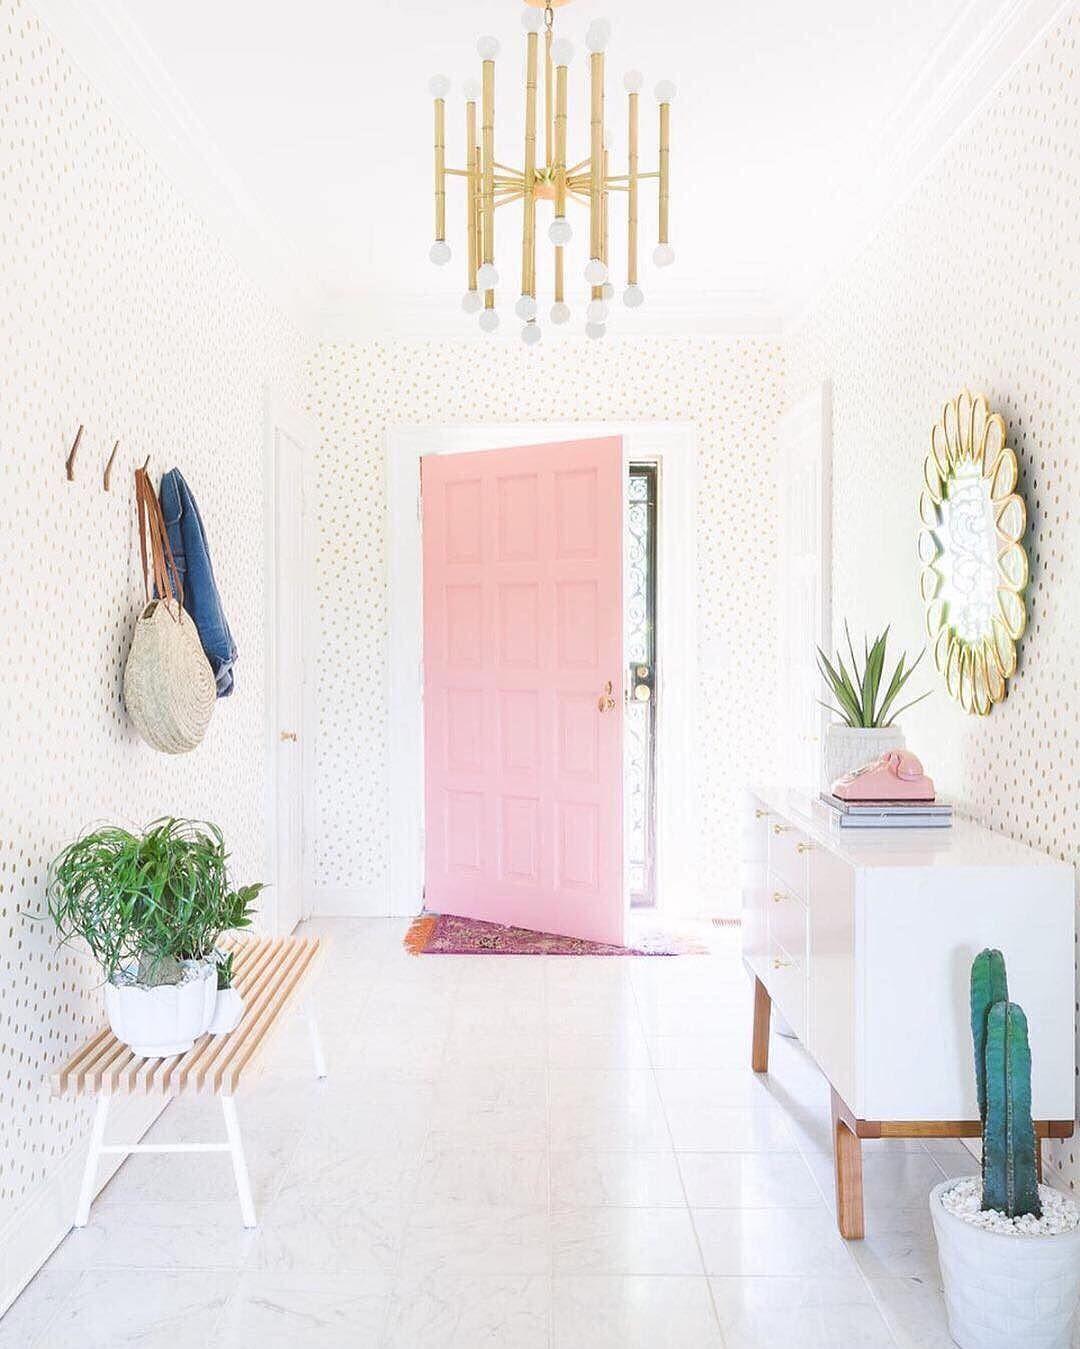 Bright hallway wallpaper  Pin by Kate Hash on Design  Detail  Pinterest  Door opener